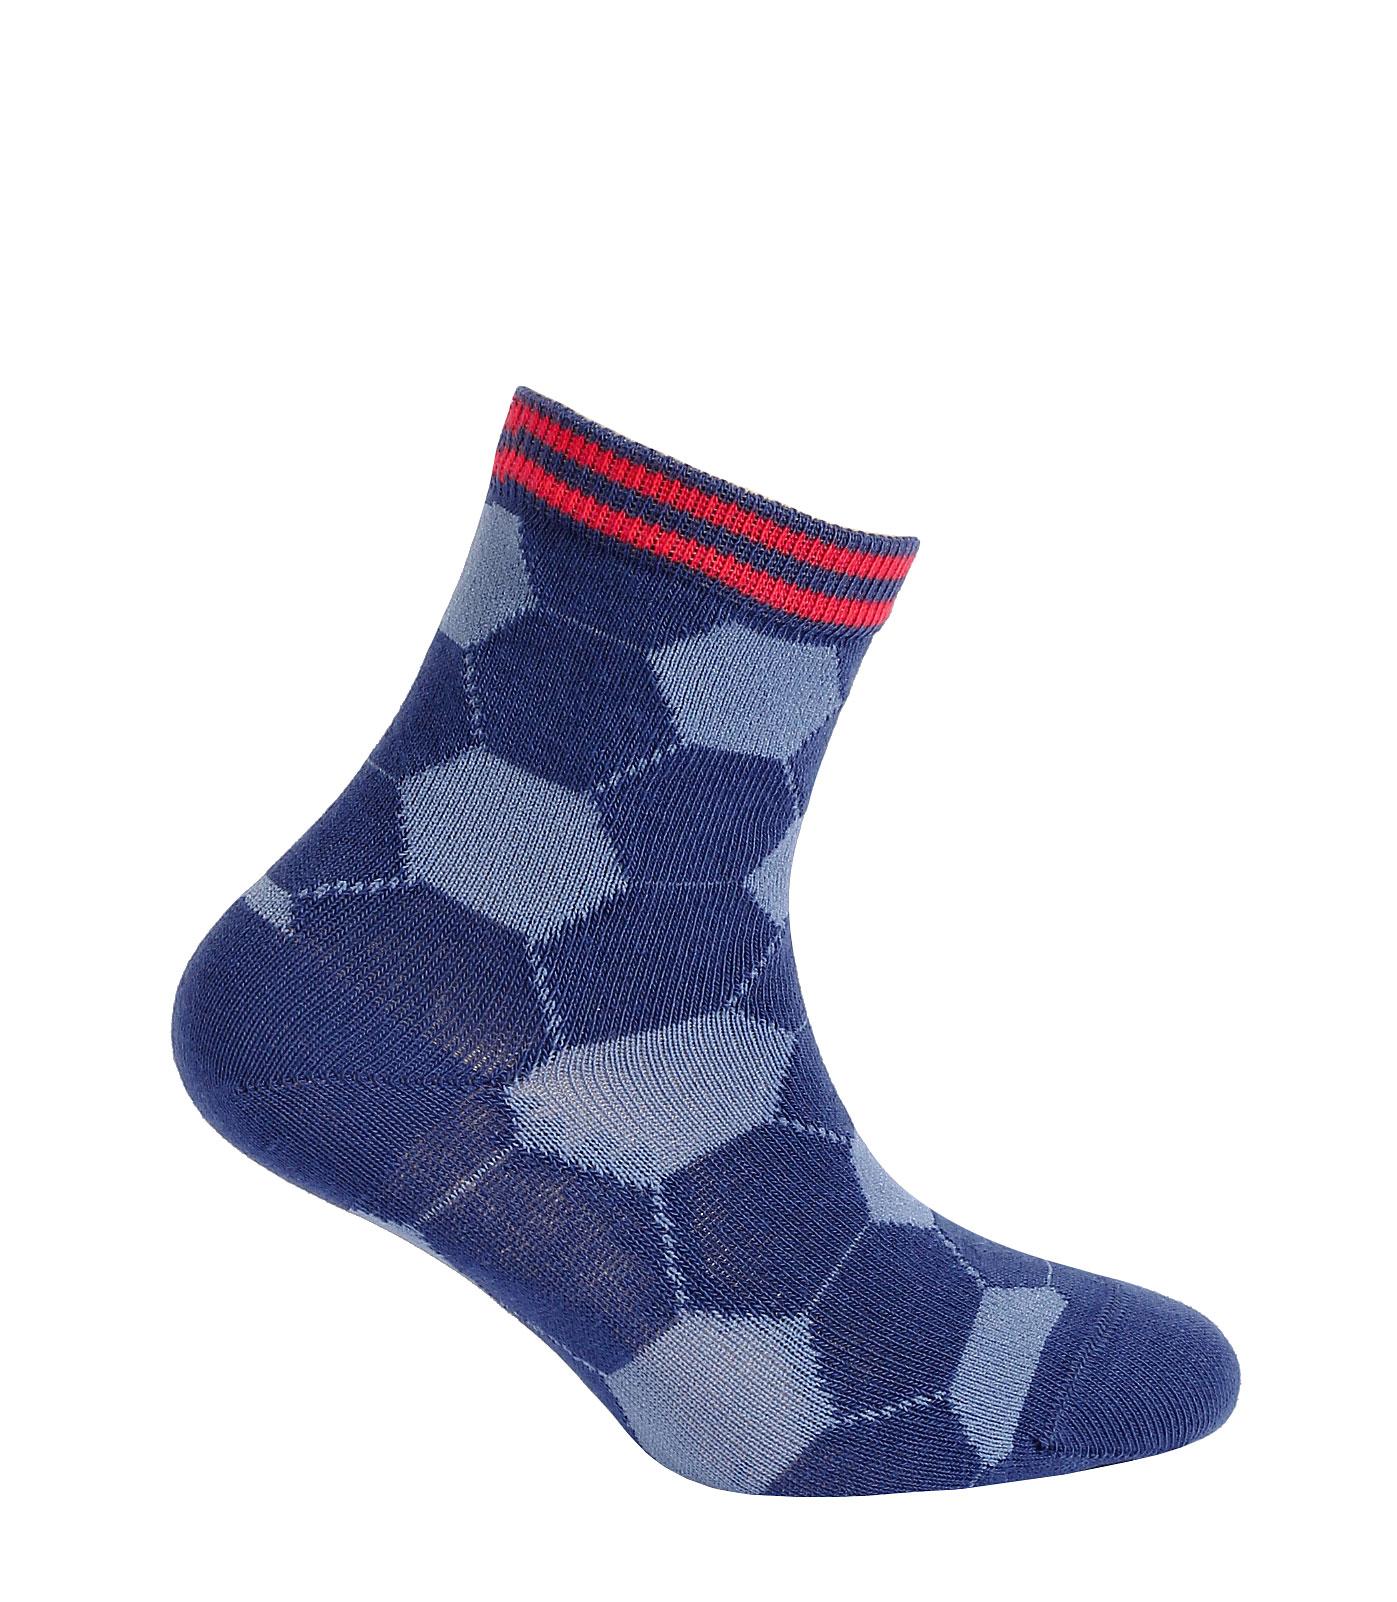 Chlapecké vzorované ponožky WOLA FOTBALOVÉ MÍČE modré Velikost: 21-23